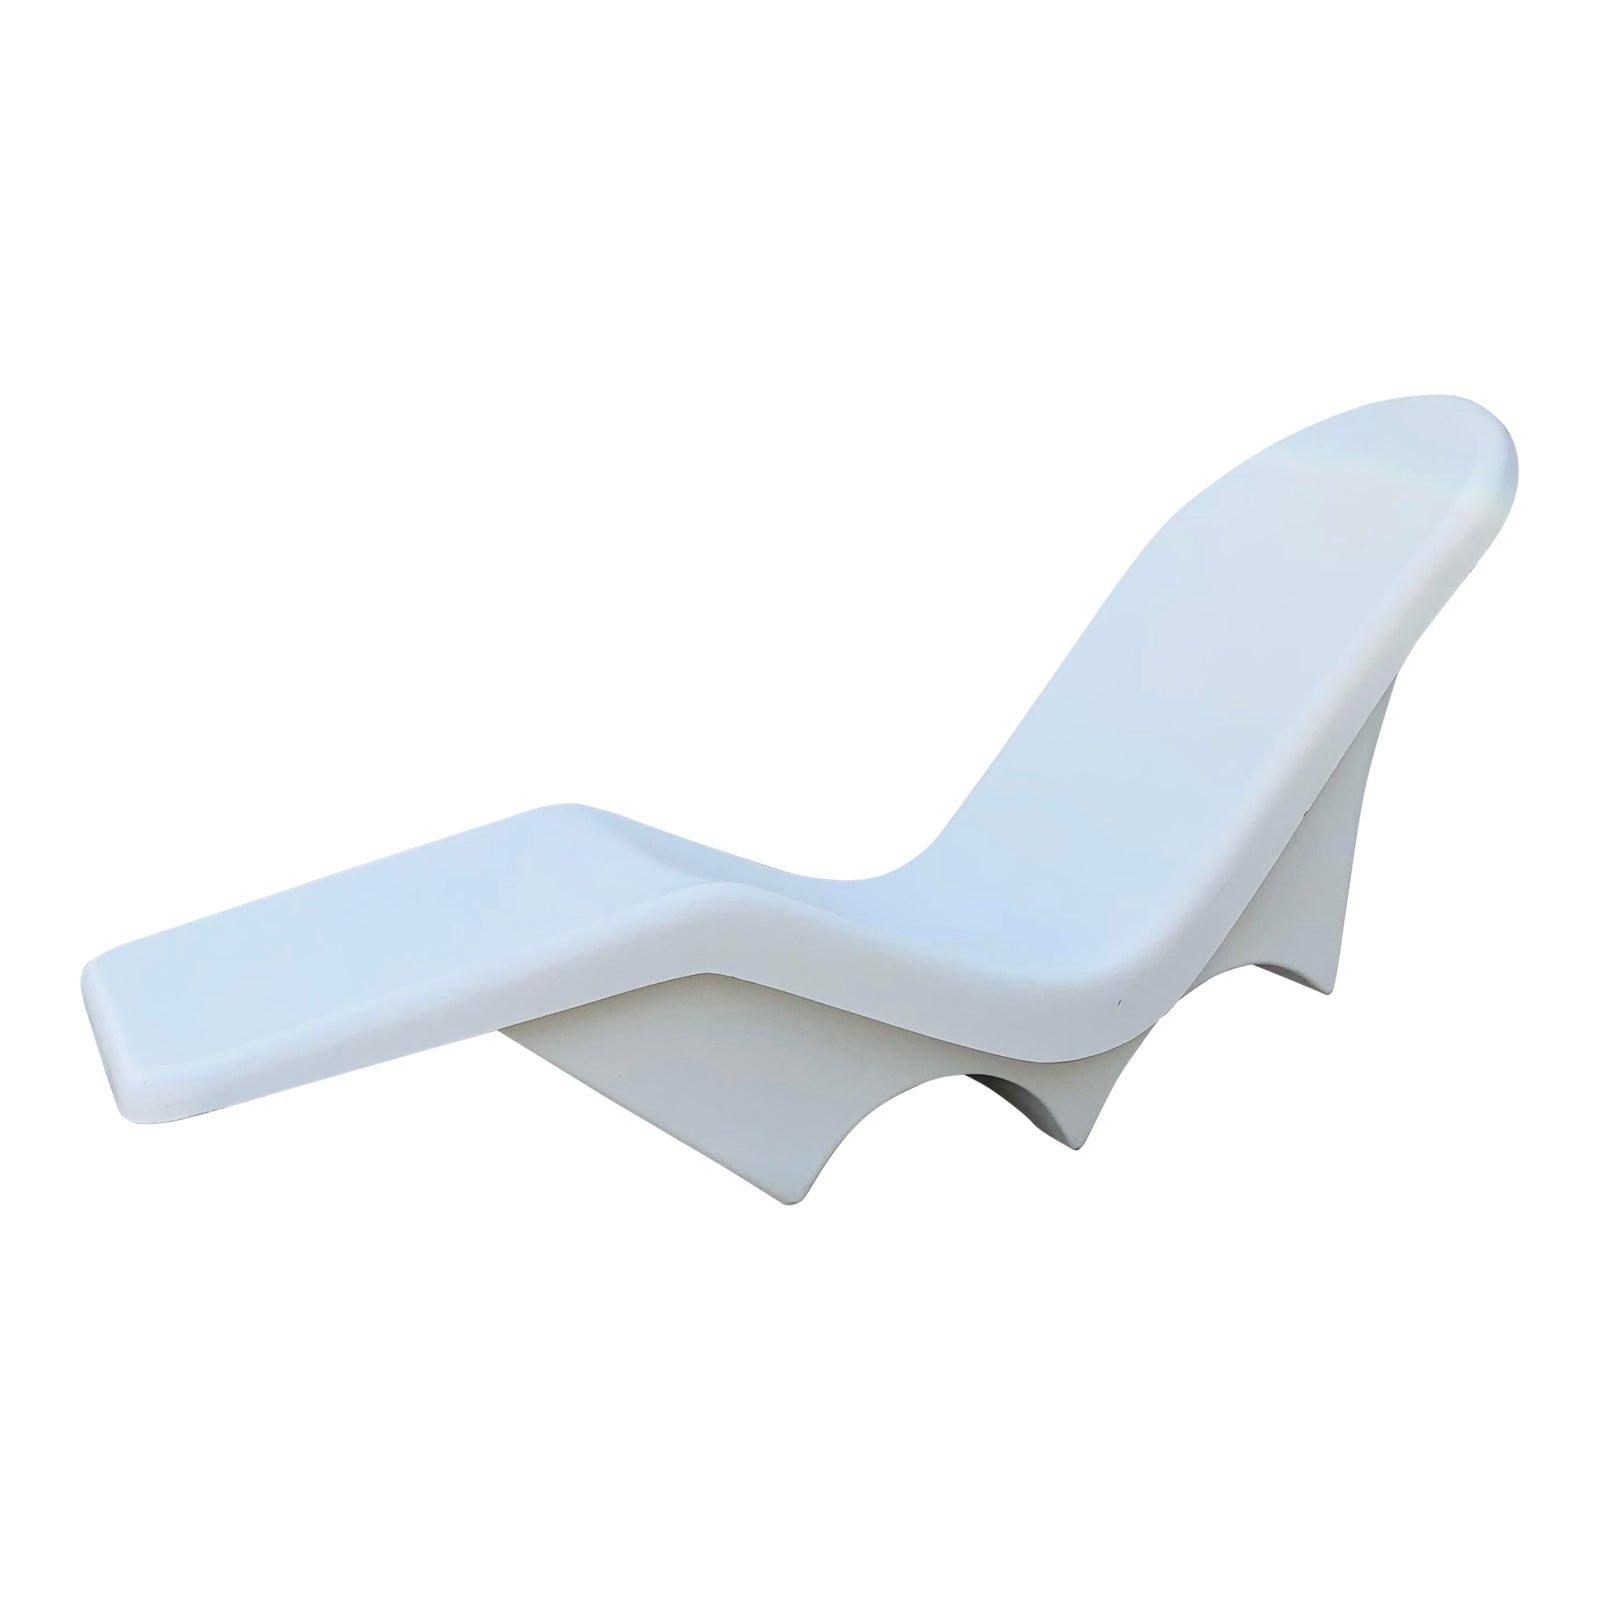 Mid-Century Fibrella Fiberglass Pool Sun Chaise Lounge by ...